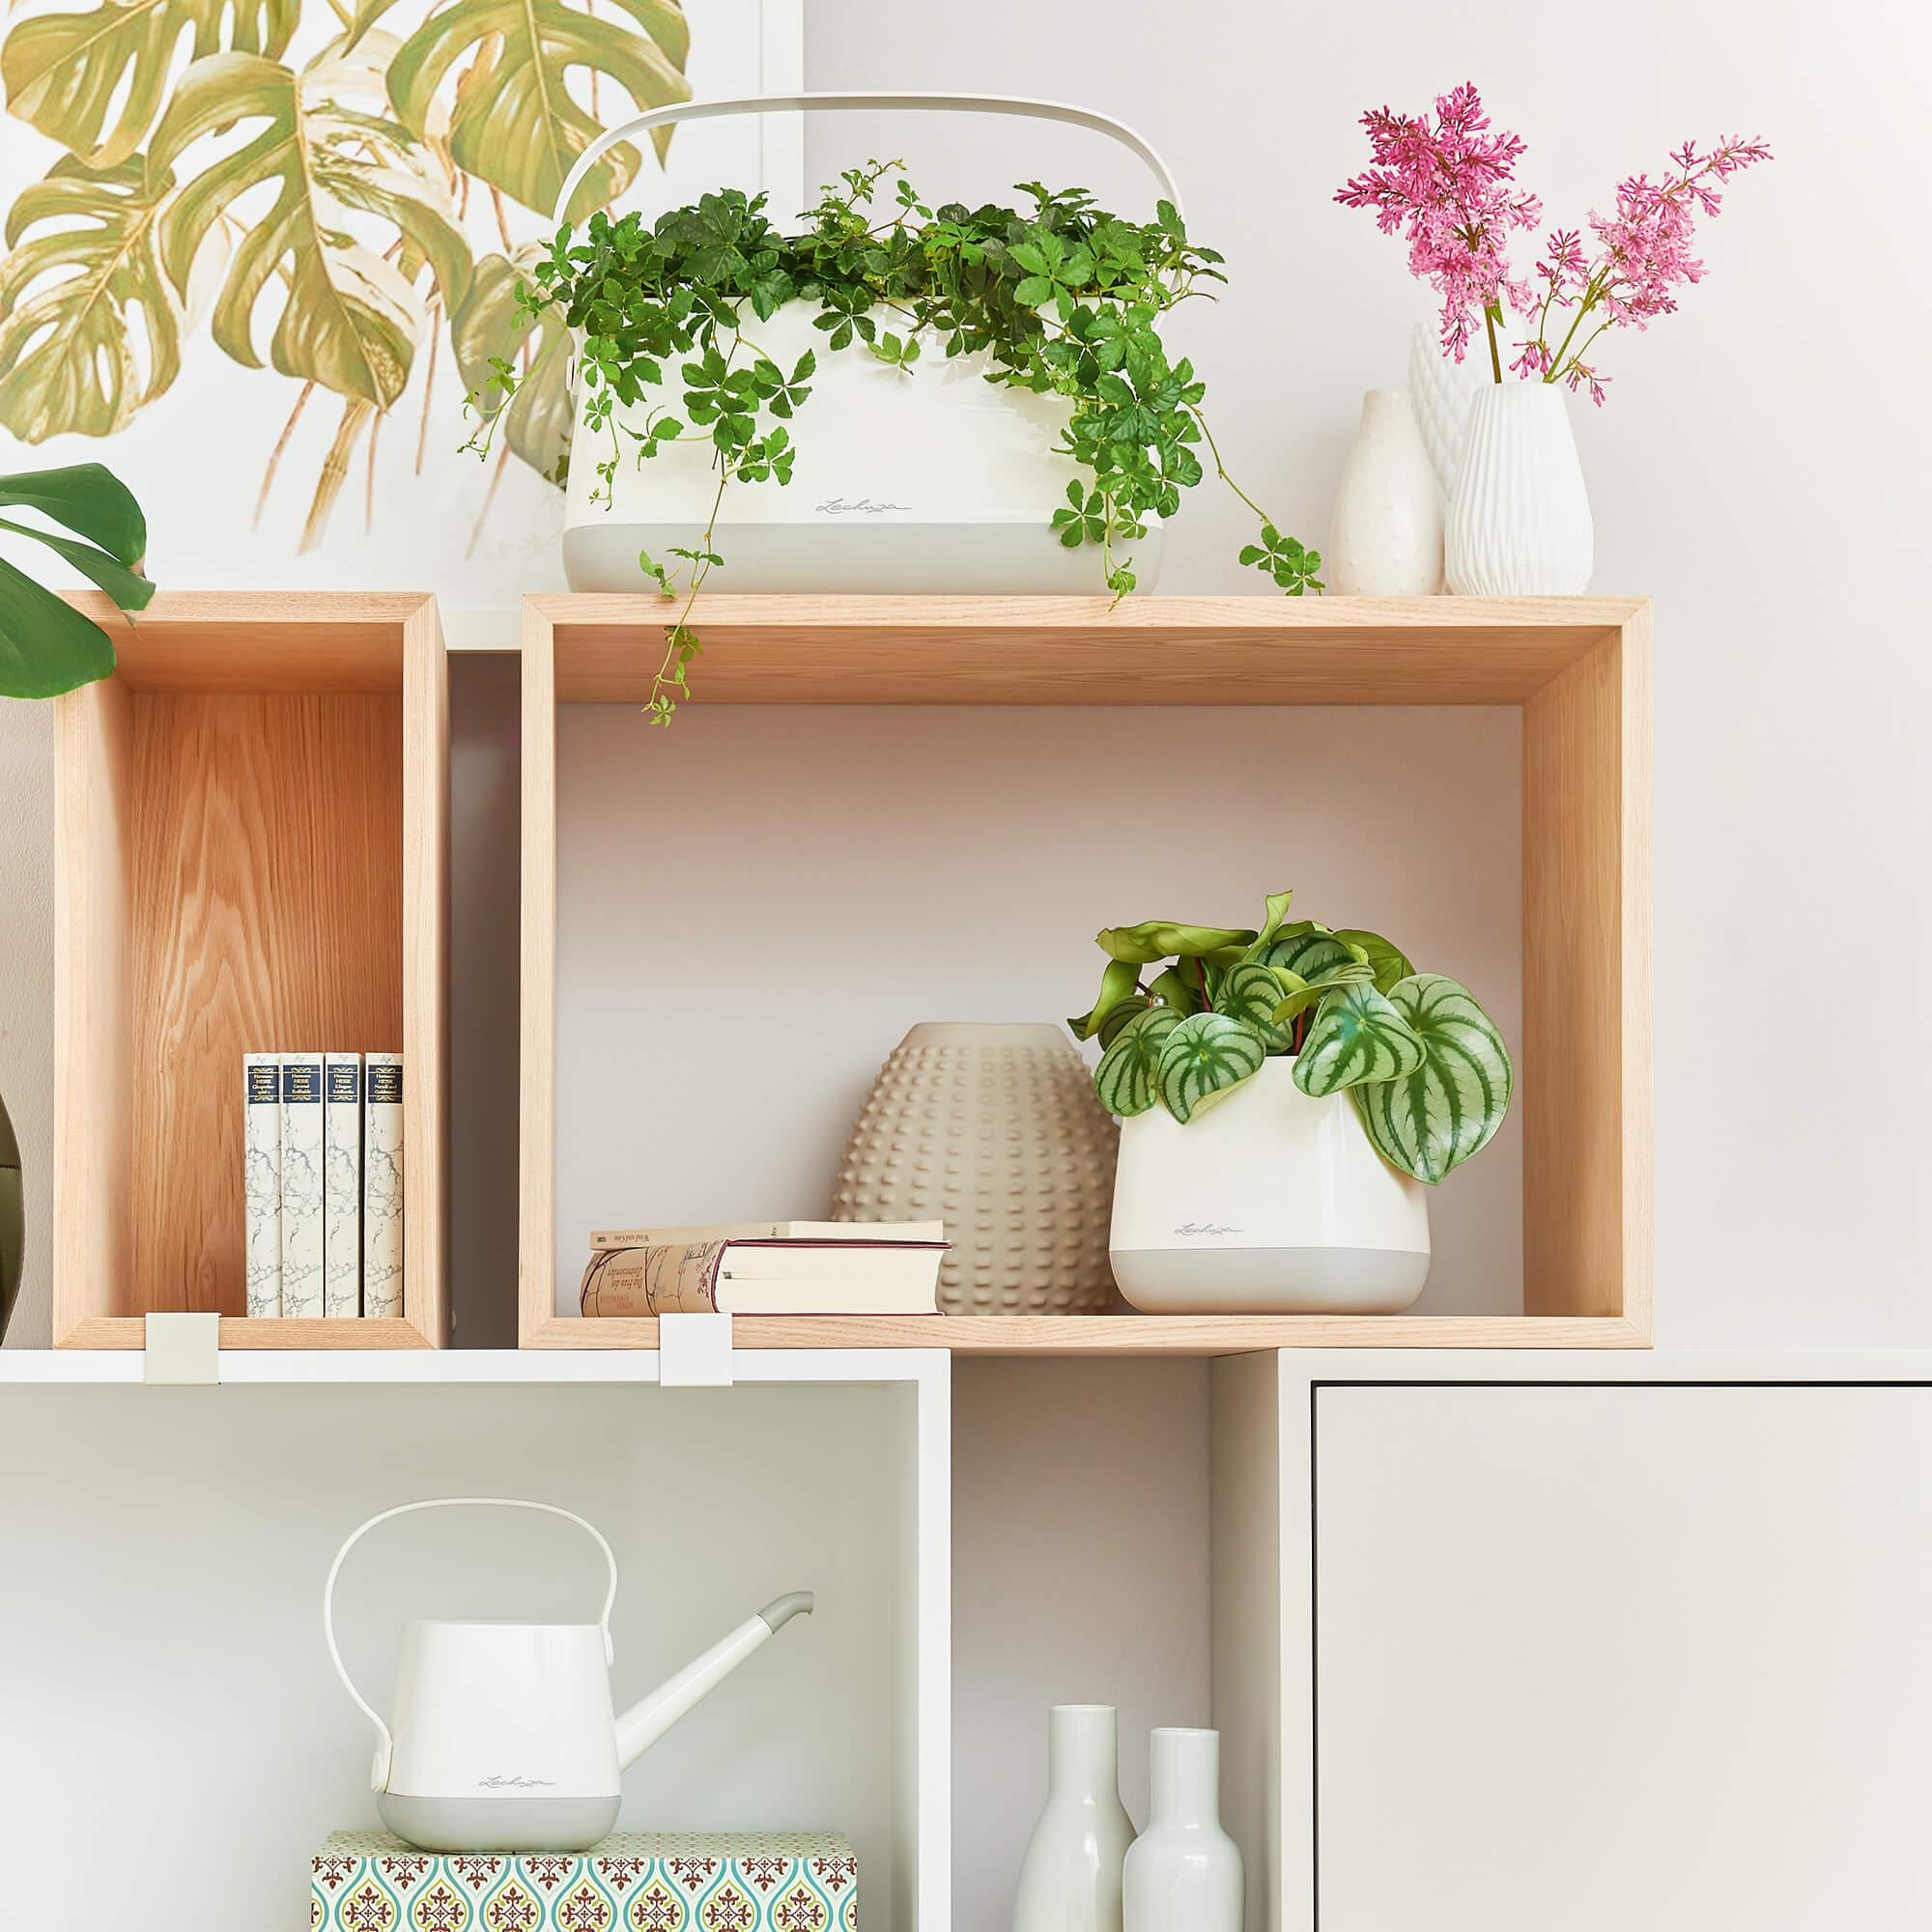 YULA planter white/pistachio semi-gloss - Image 8